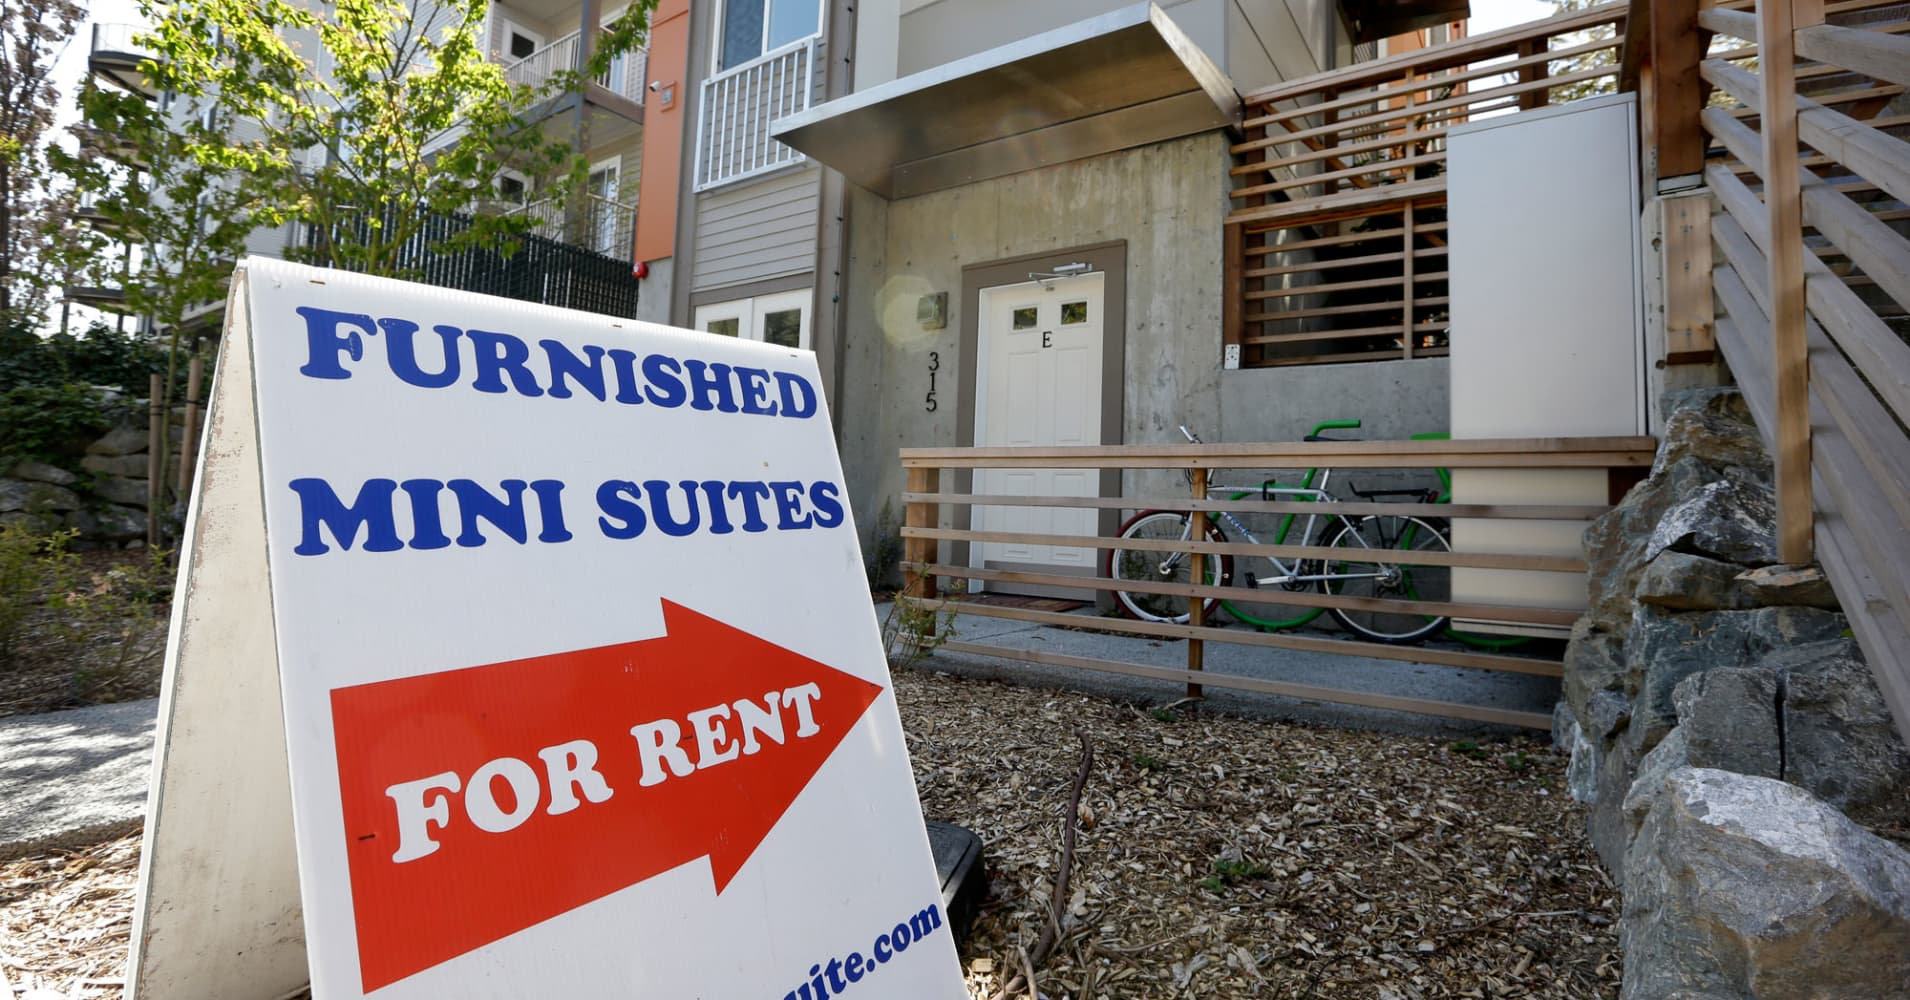 10 hottest rental markets to make investors' landlord dreams come true